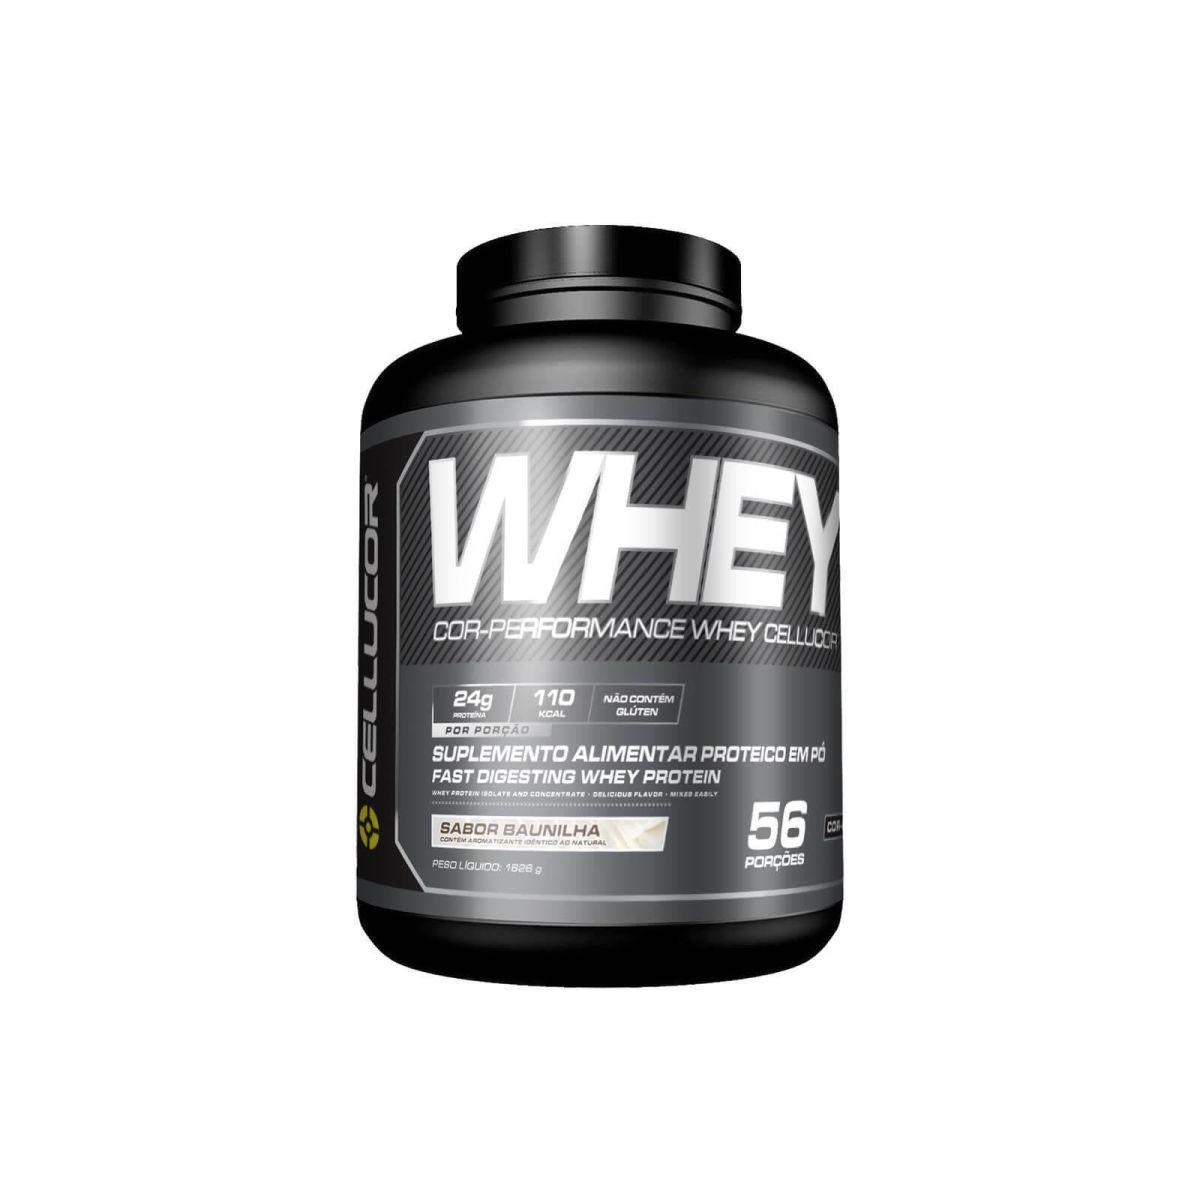 Whey Cor-Performance 4LBS - Cellucor